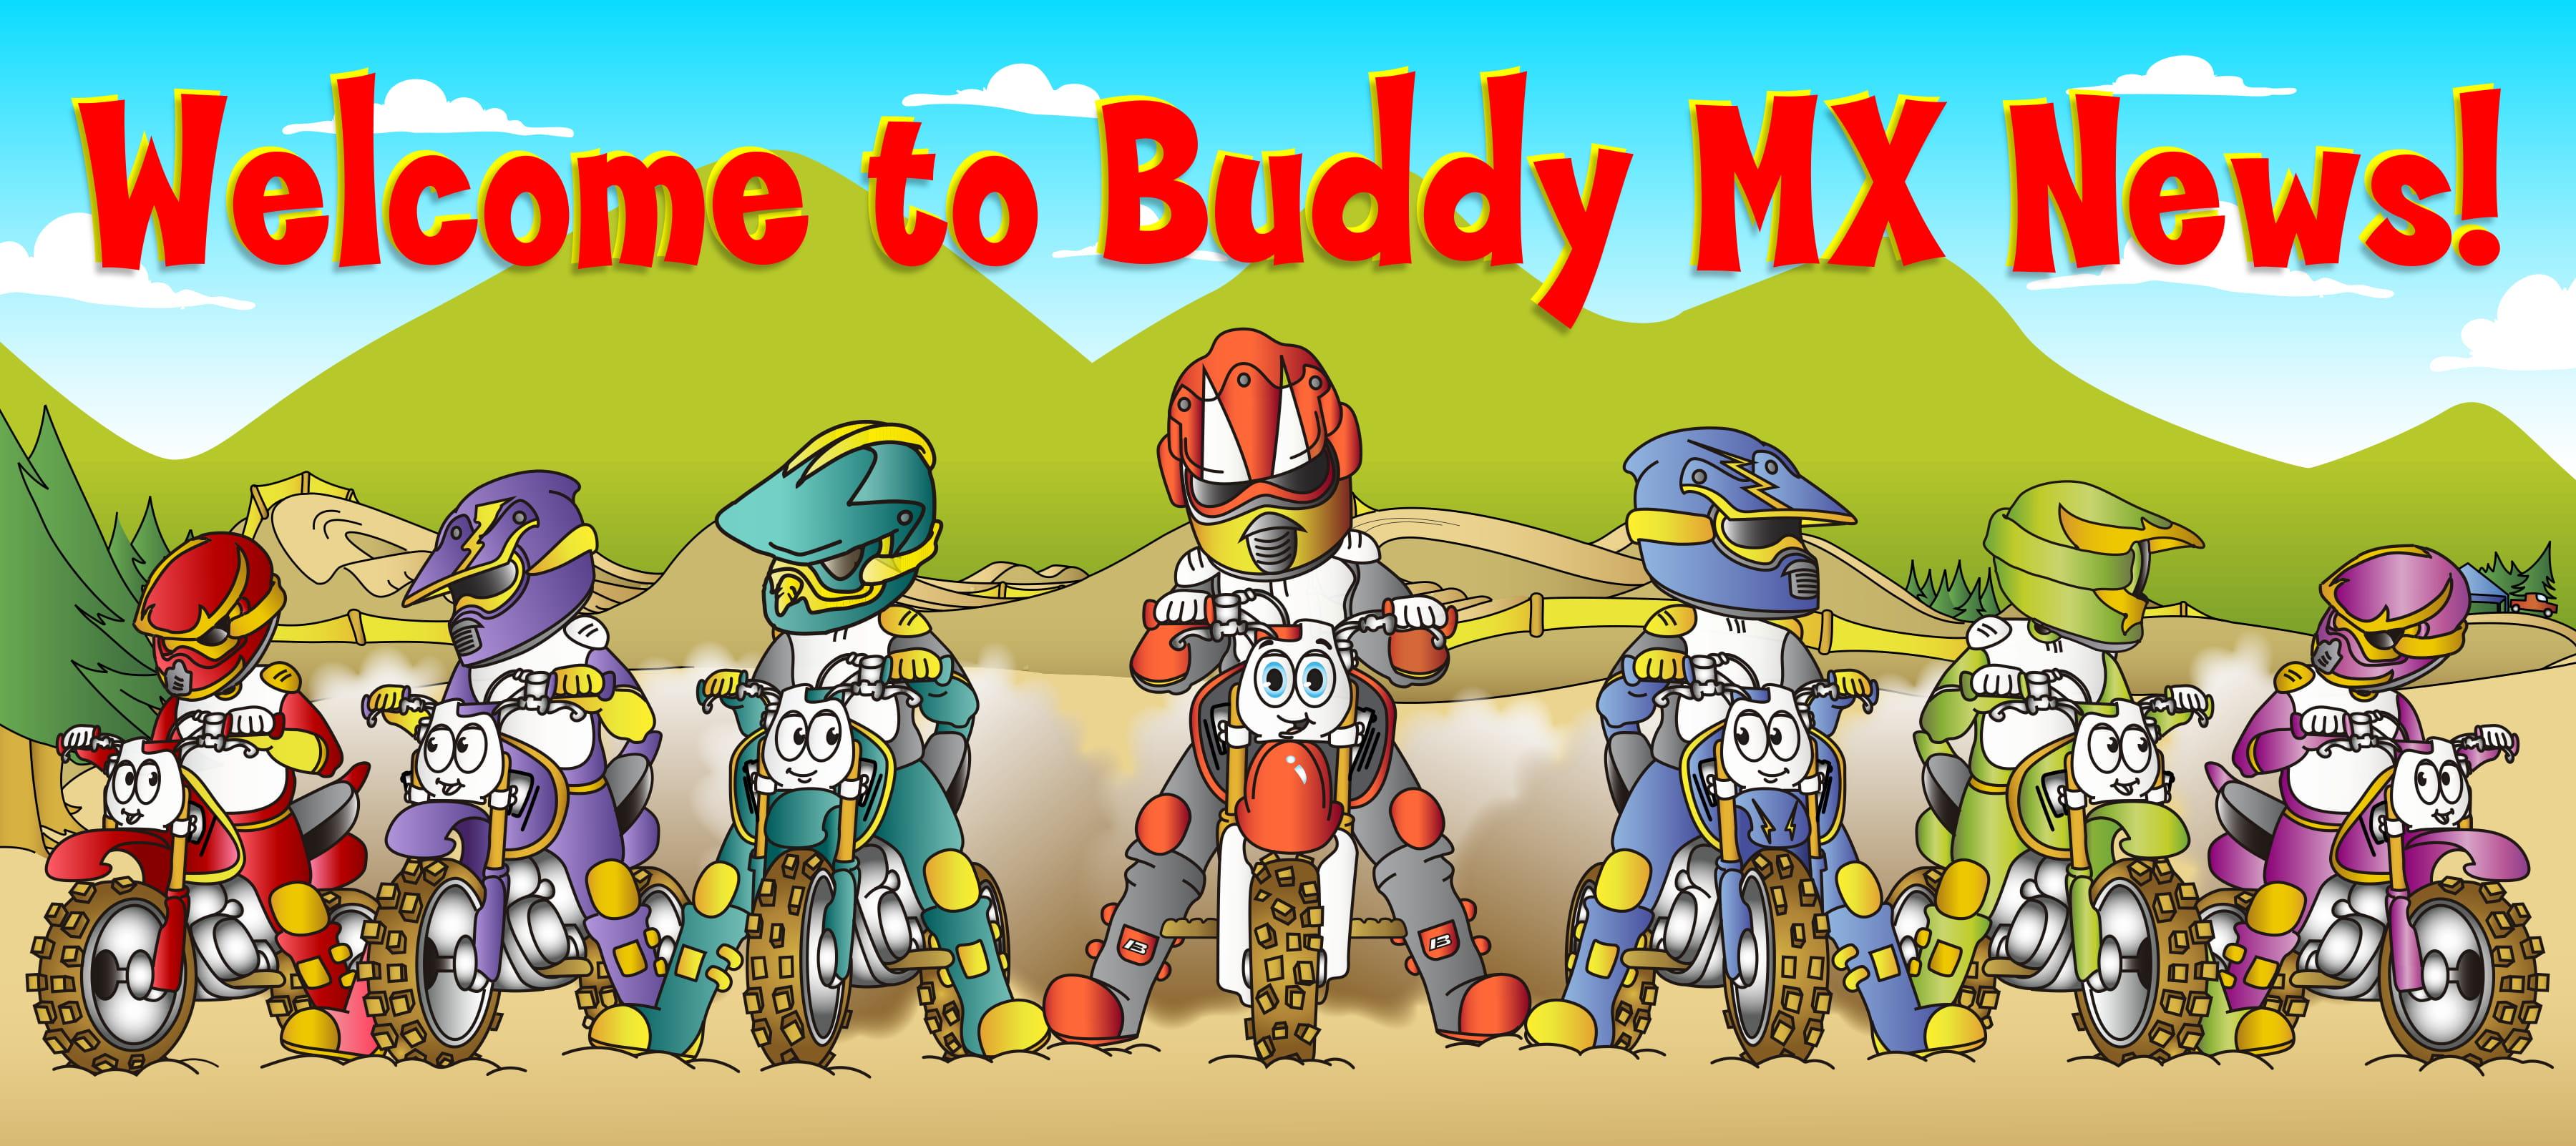 Welcome to Buddy MX News!